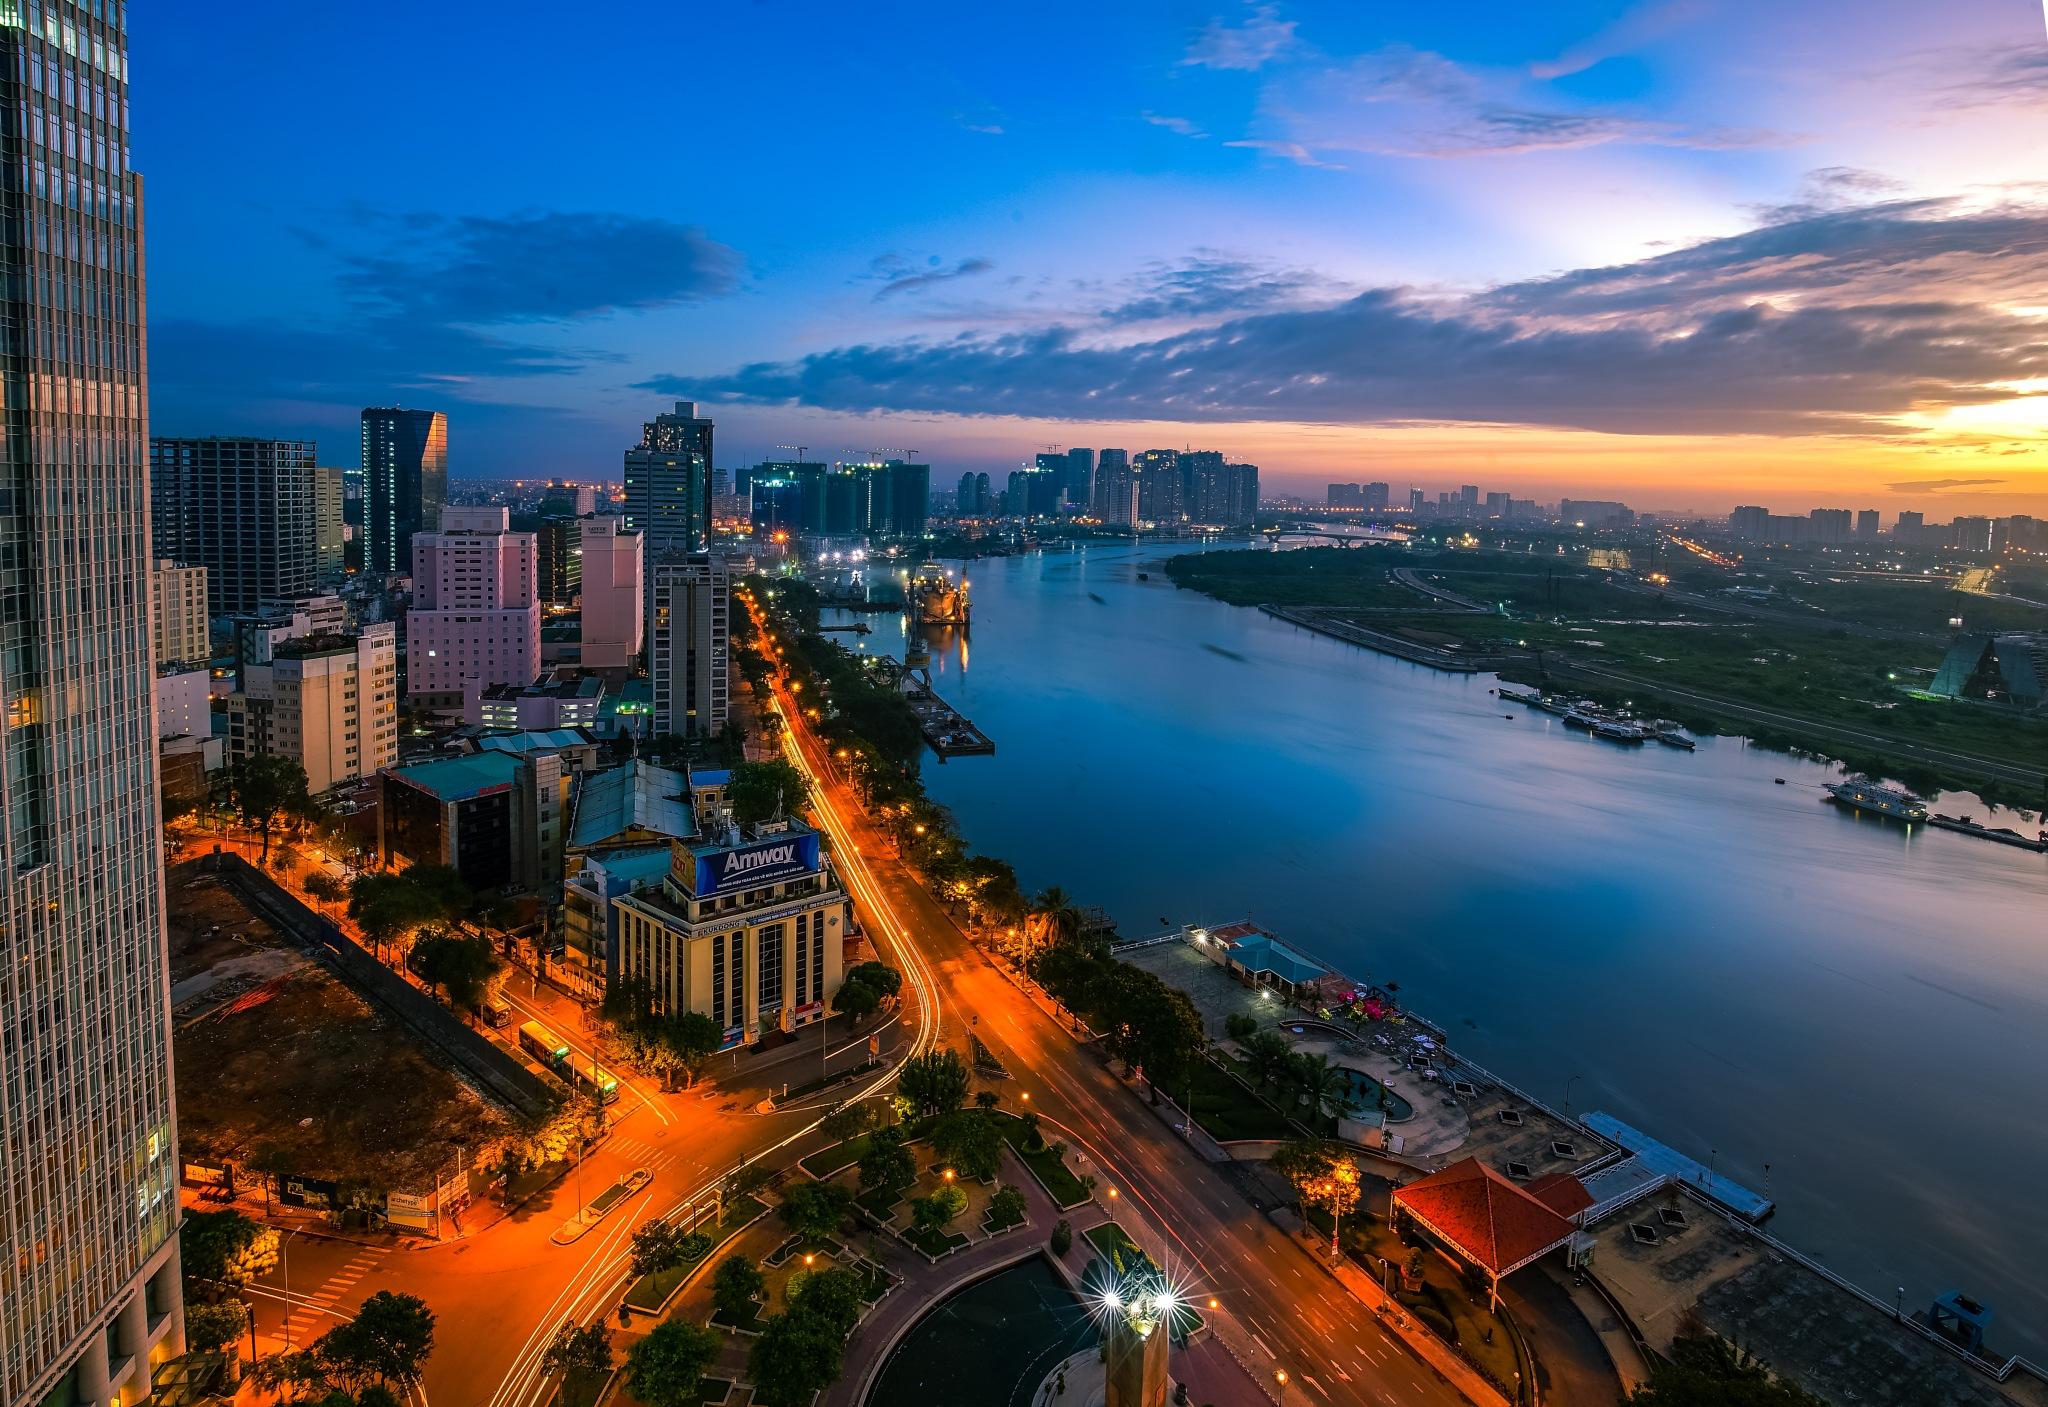 Sunrise in my city by Alex Pham